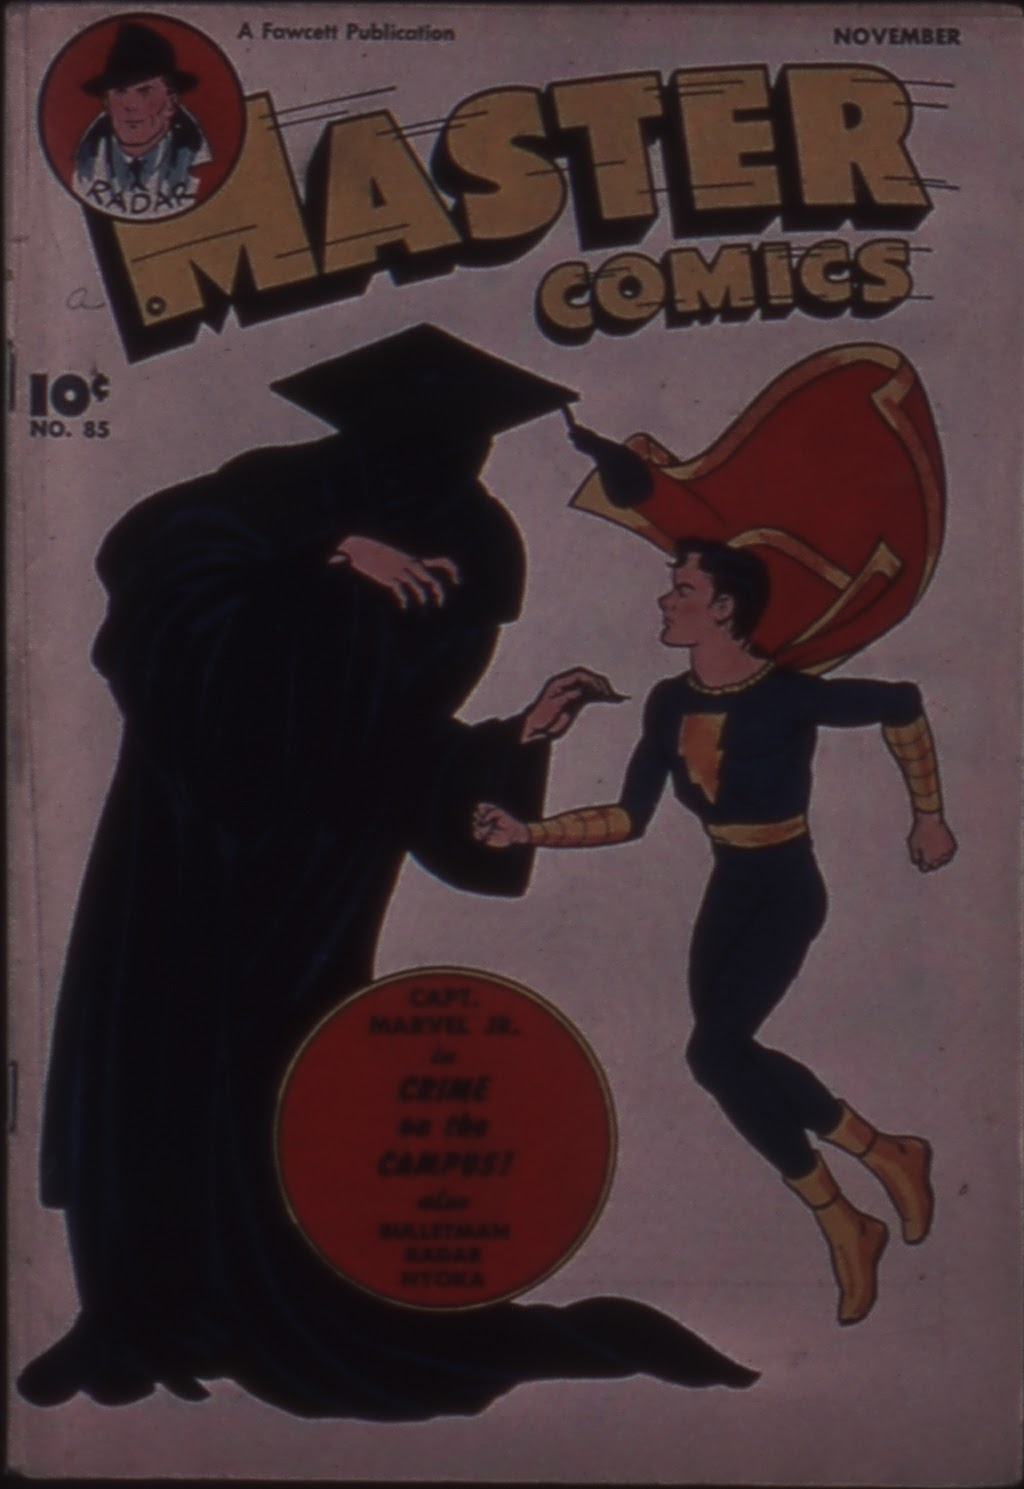 Master Comics 85 Page 1